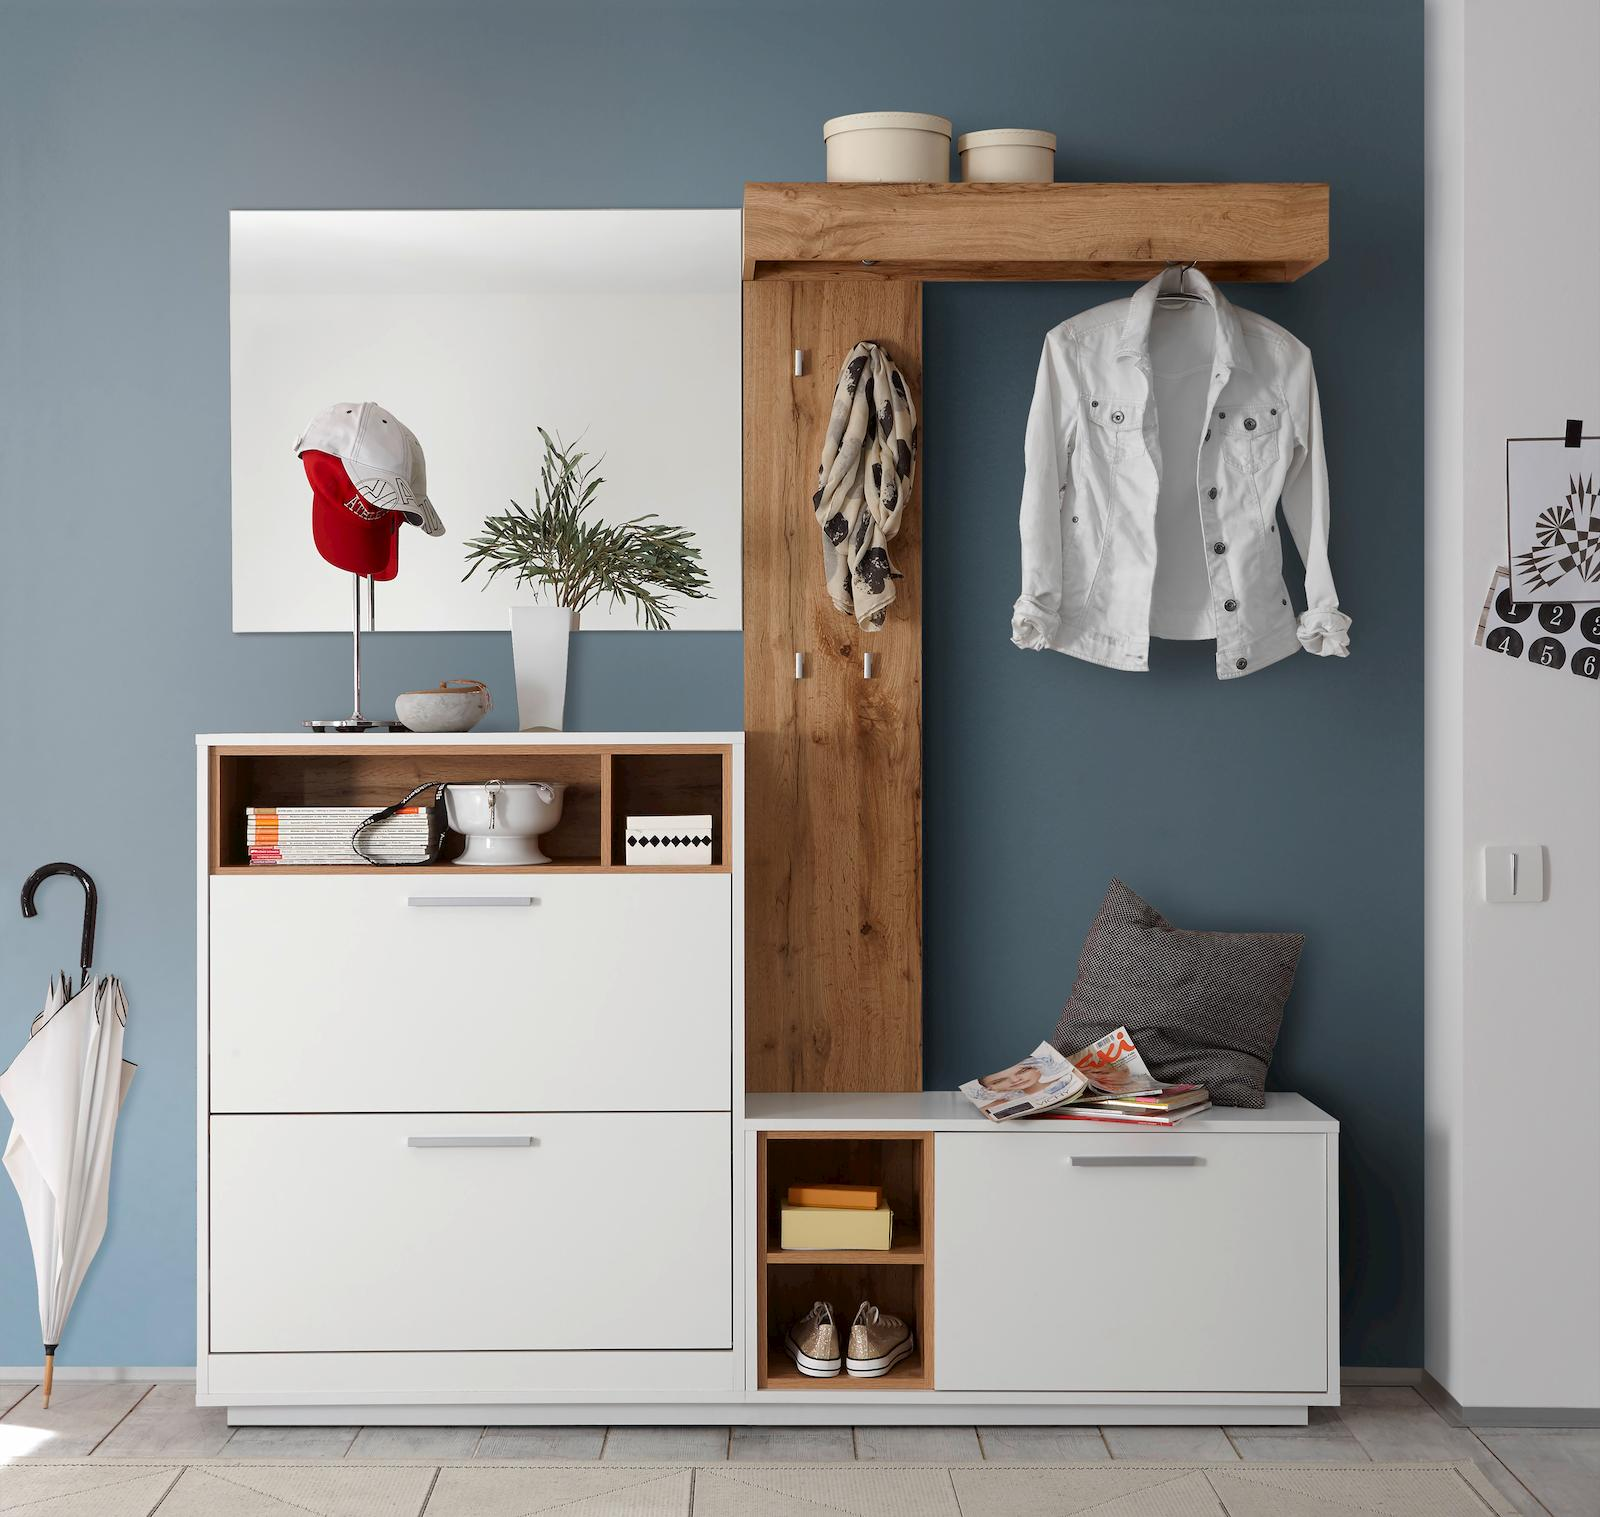 4 tlg milano garderobenkombination garderobe garderobeset for Garderoben sitzbank schuhschrank